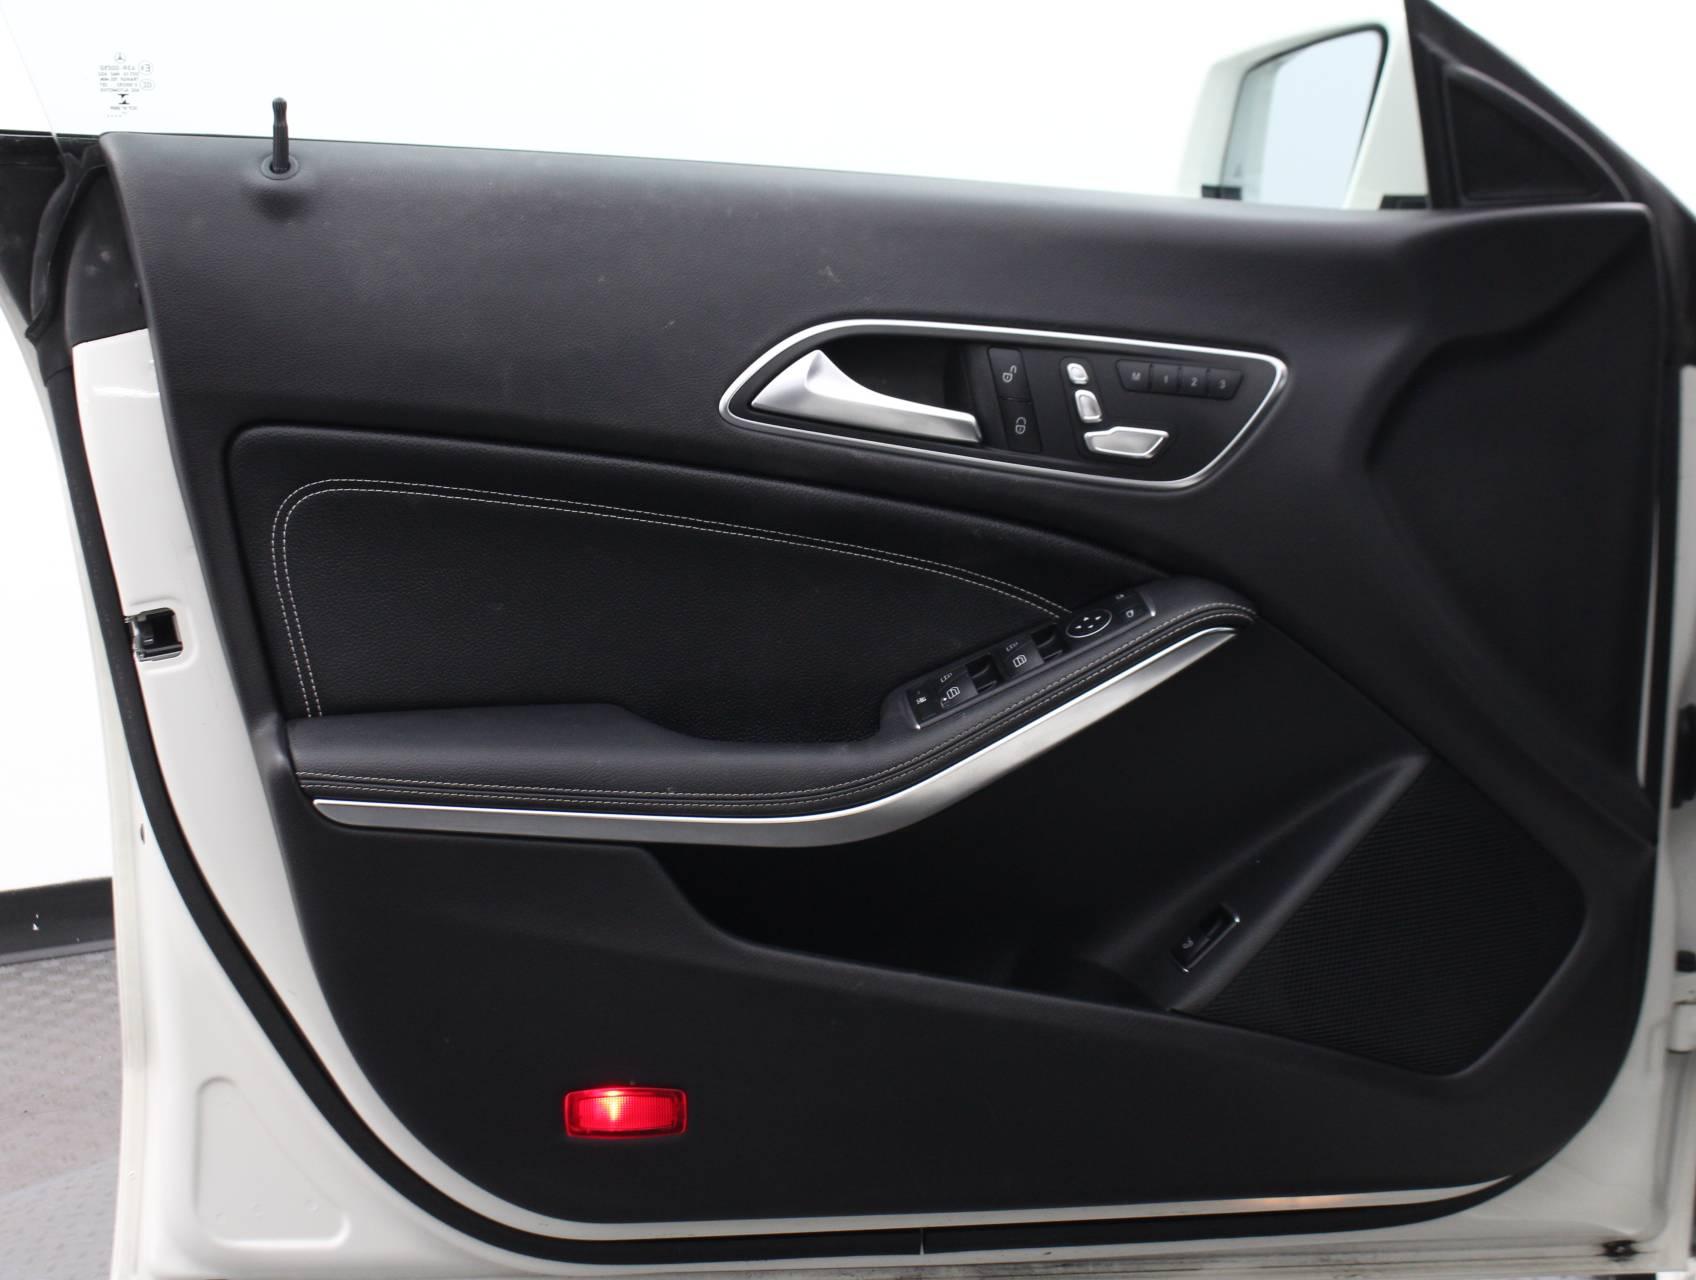 used vehicle - Sedan MERCEDES-BENZ CLA 2018